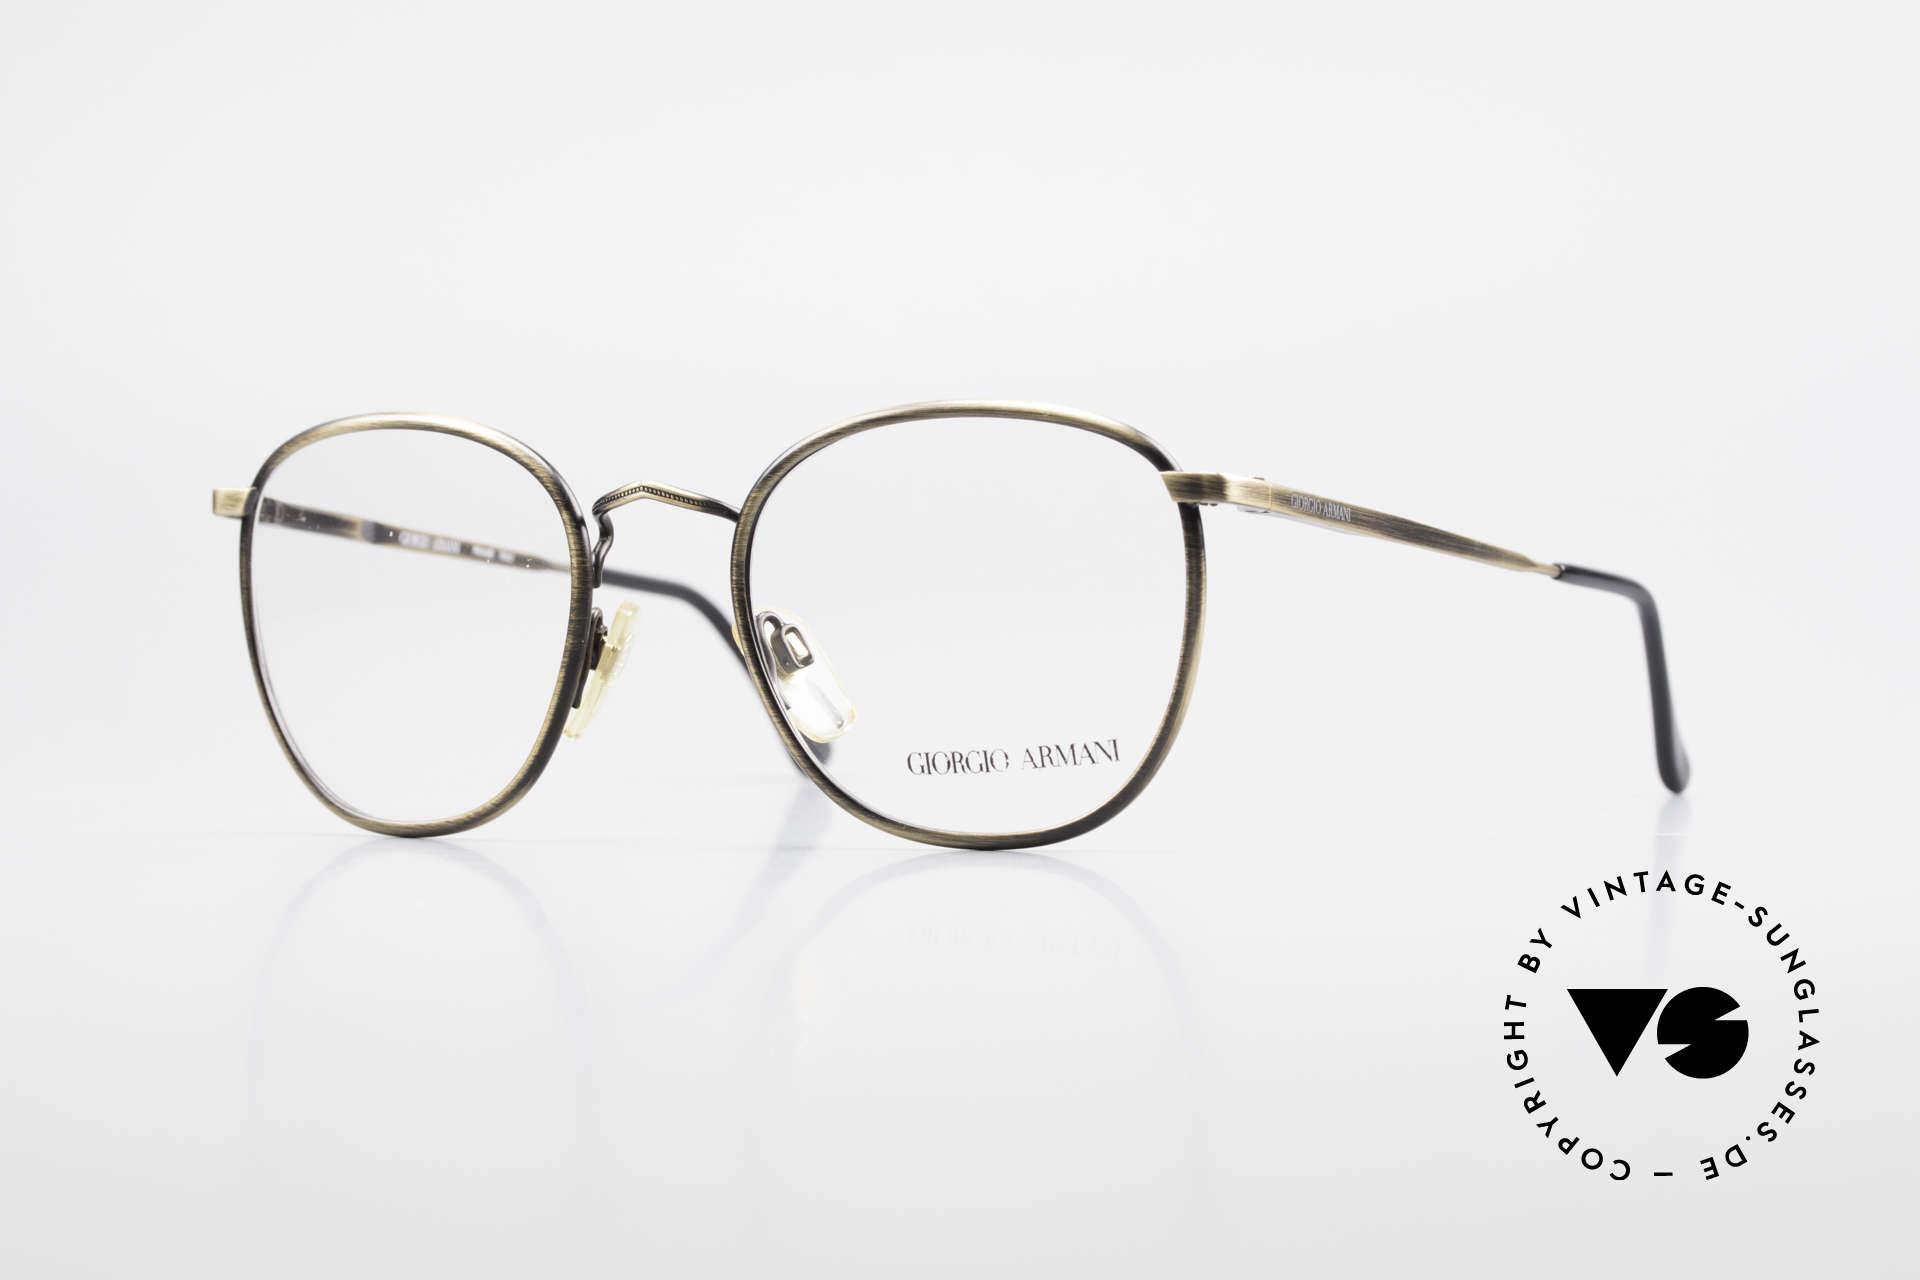 Giorgio Armani 150 Classic Men's Eyeglasses 80's, timeless vintage Giorgio Armani designer eyeglasses, Made for Men